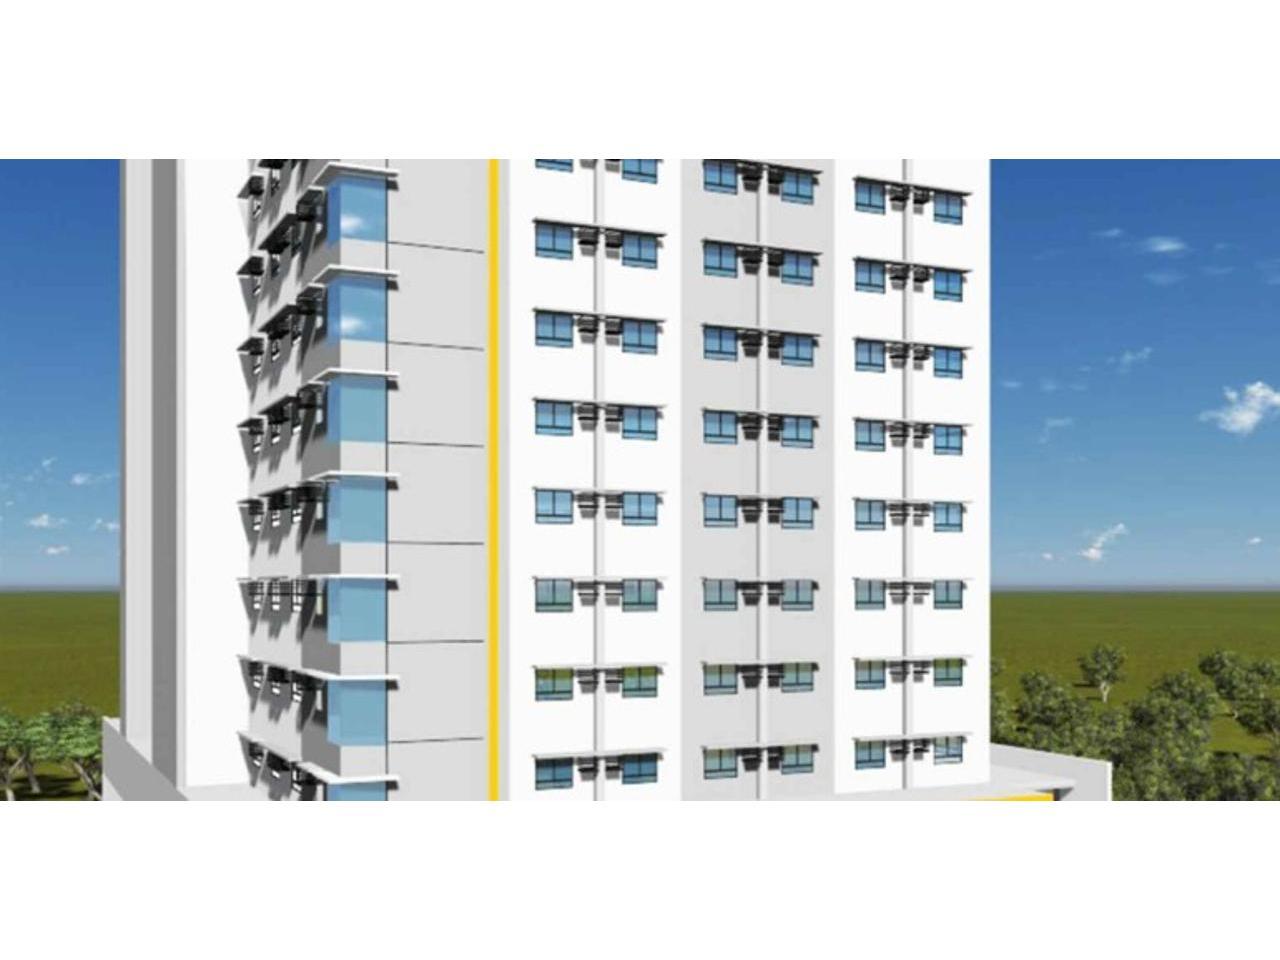 Condominium For sale in Sudlon, Cebu City, Sudlon, Cebu